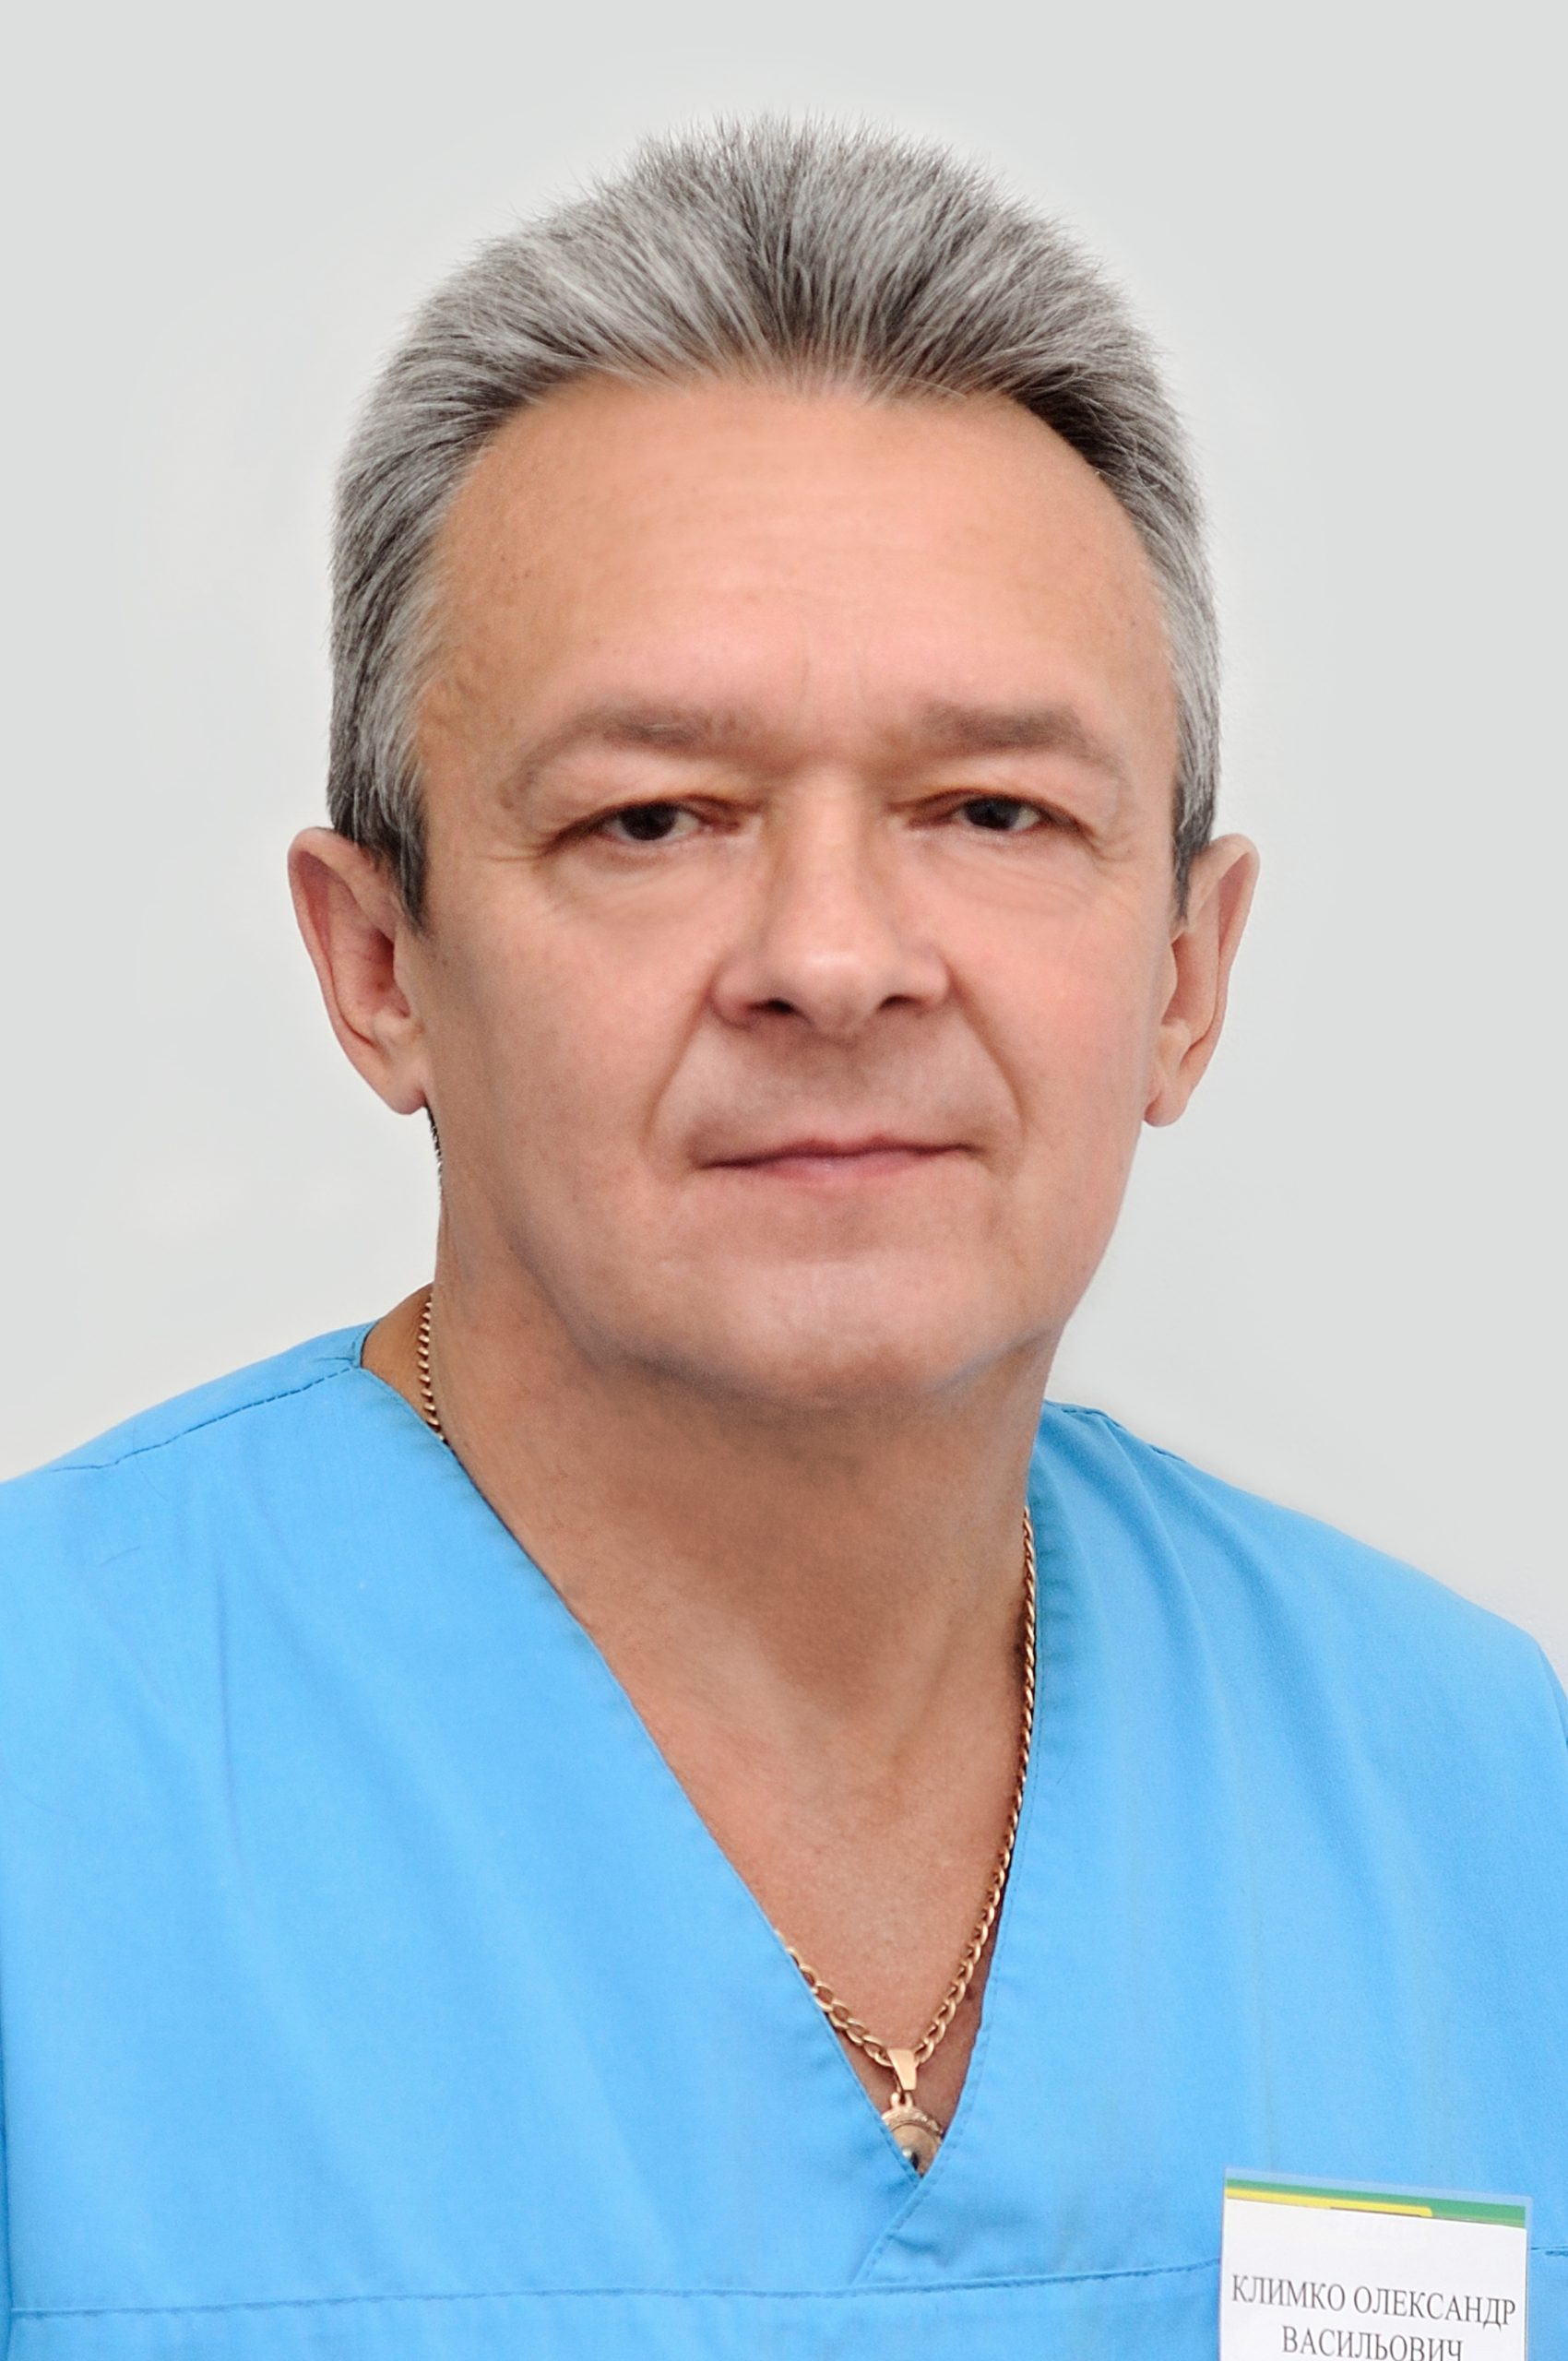 Климко Александр Васильевич